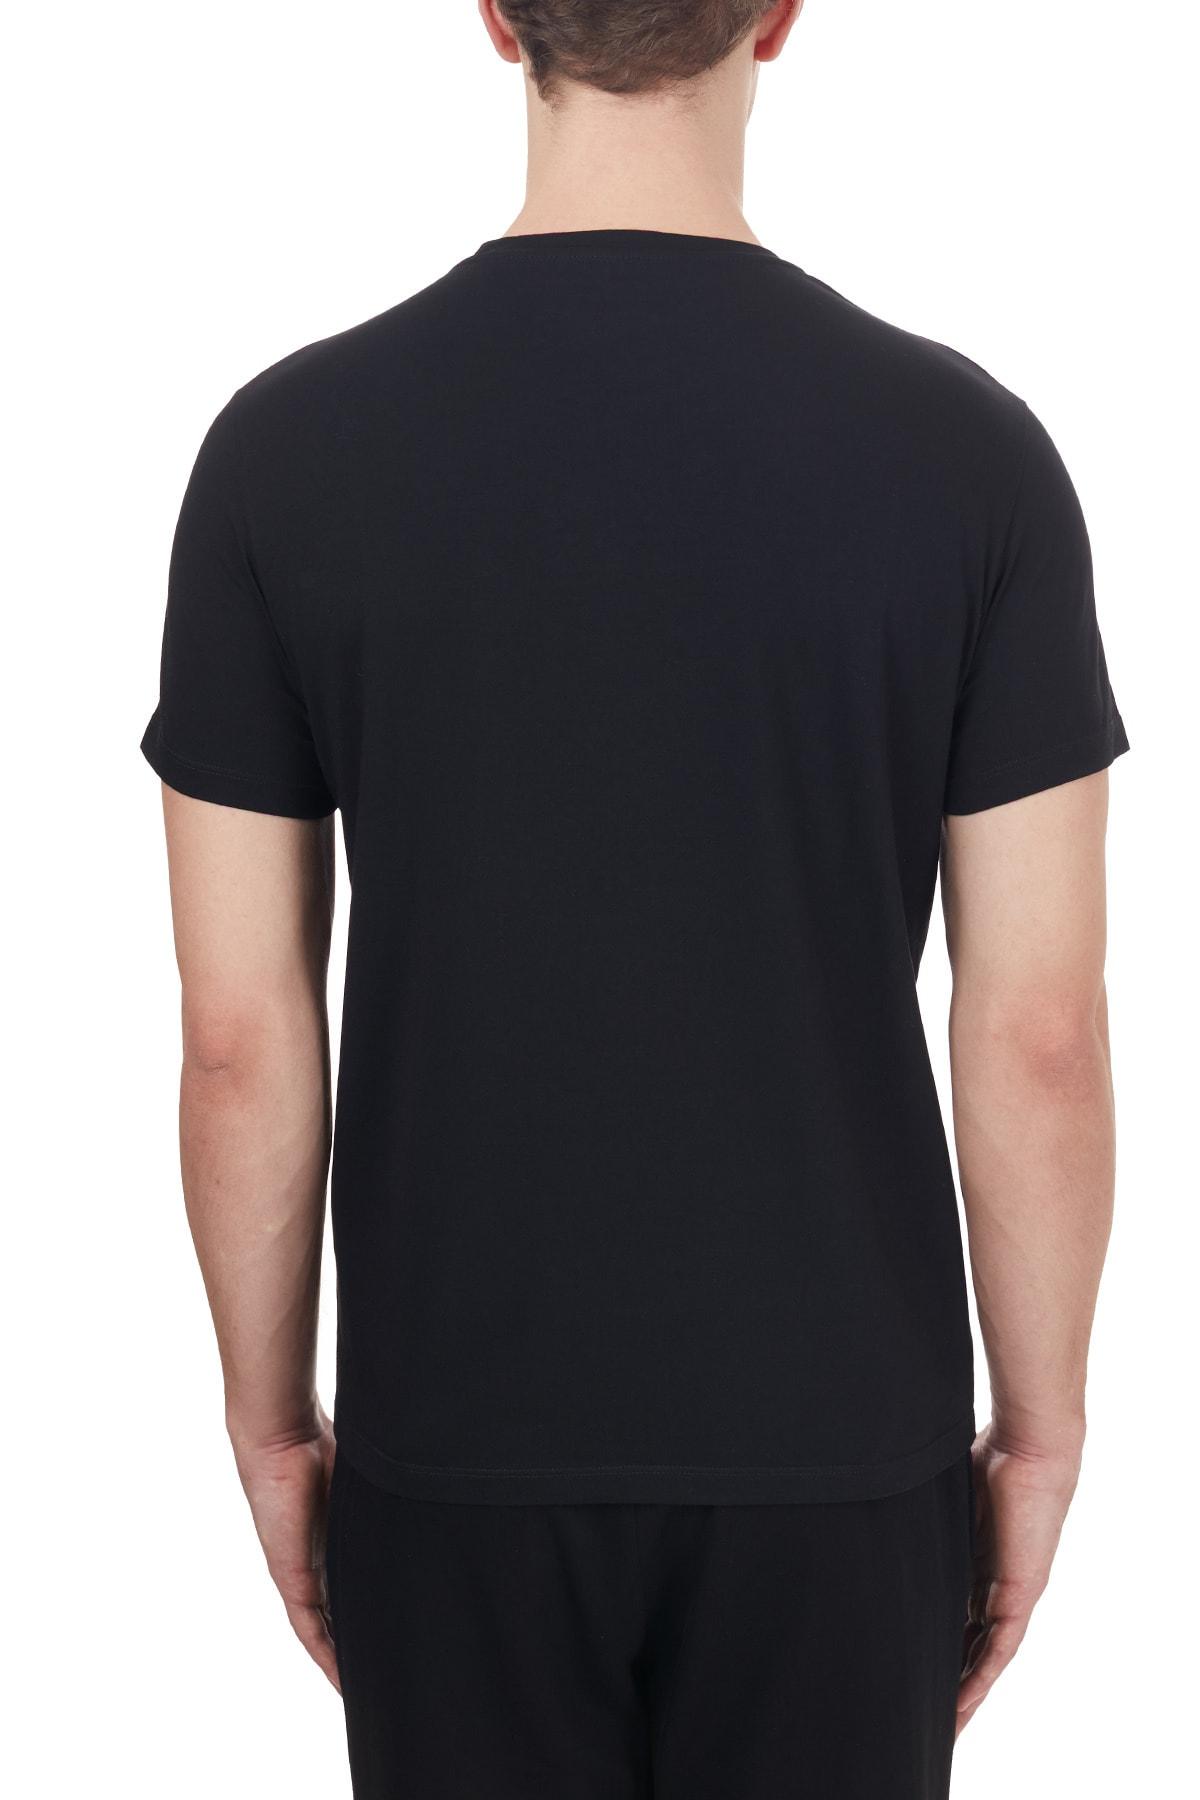 ETRO Pamuklu Bisiklet Yaka T Shirt Erkek T Shirt 1y020 97590 001 2